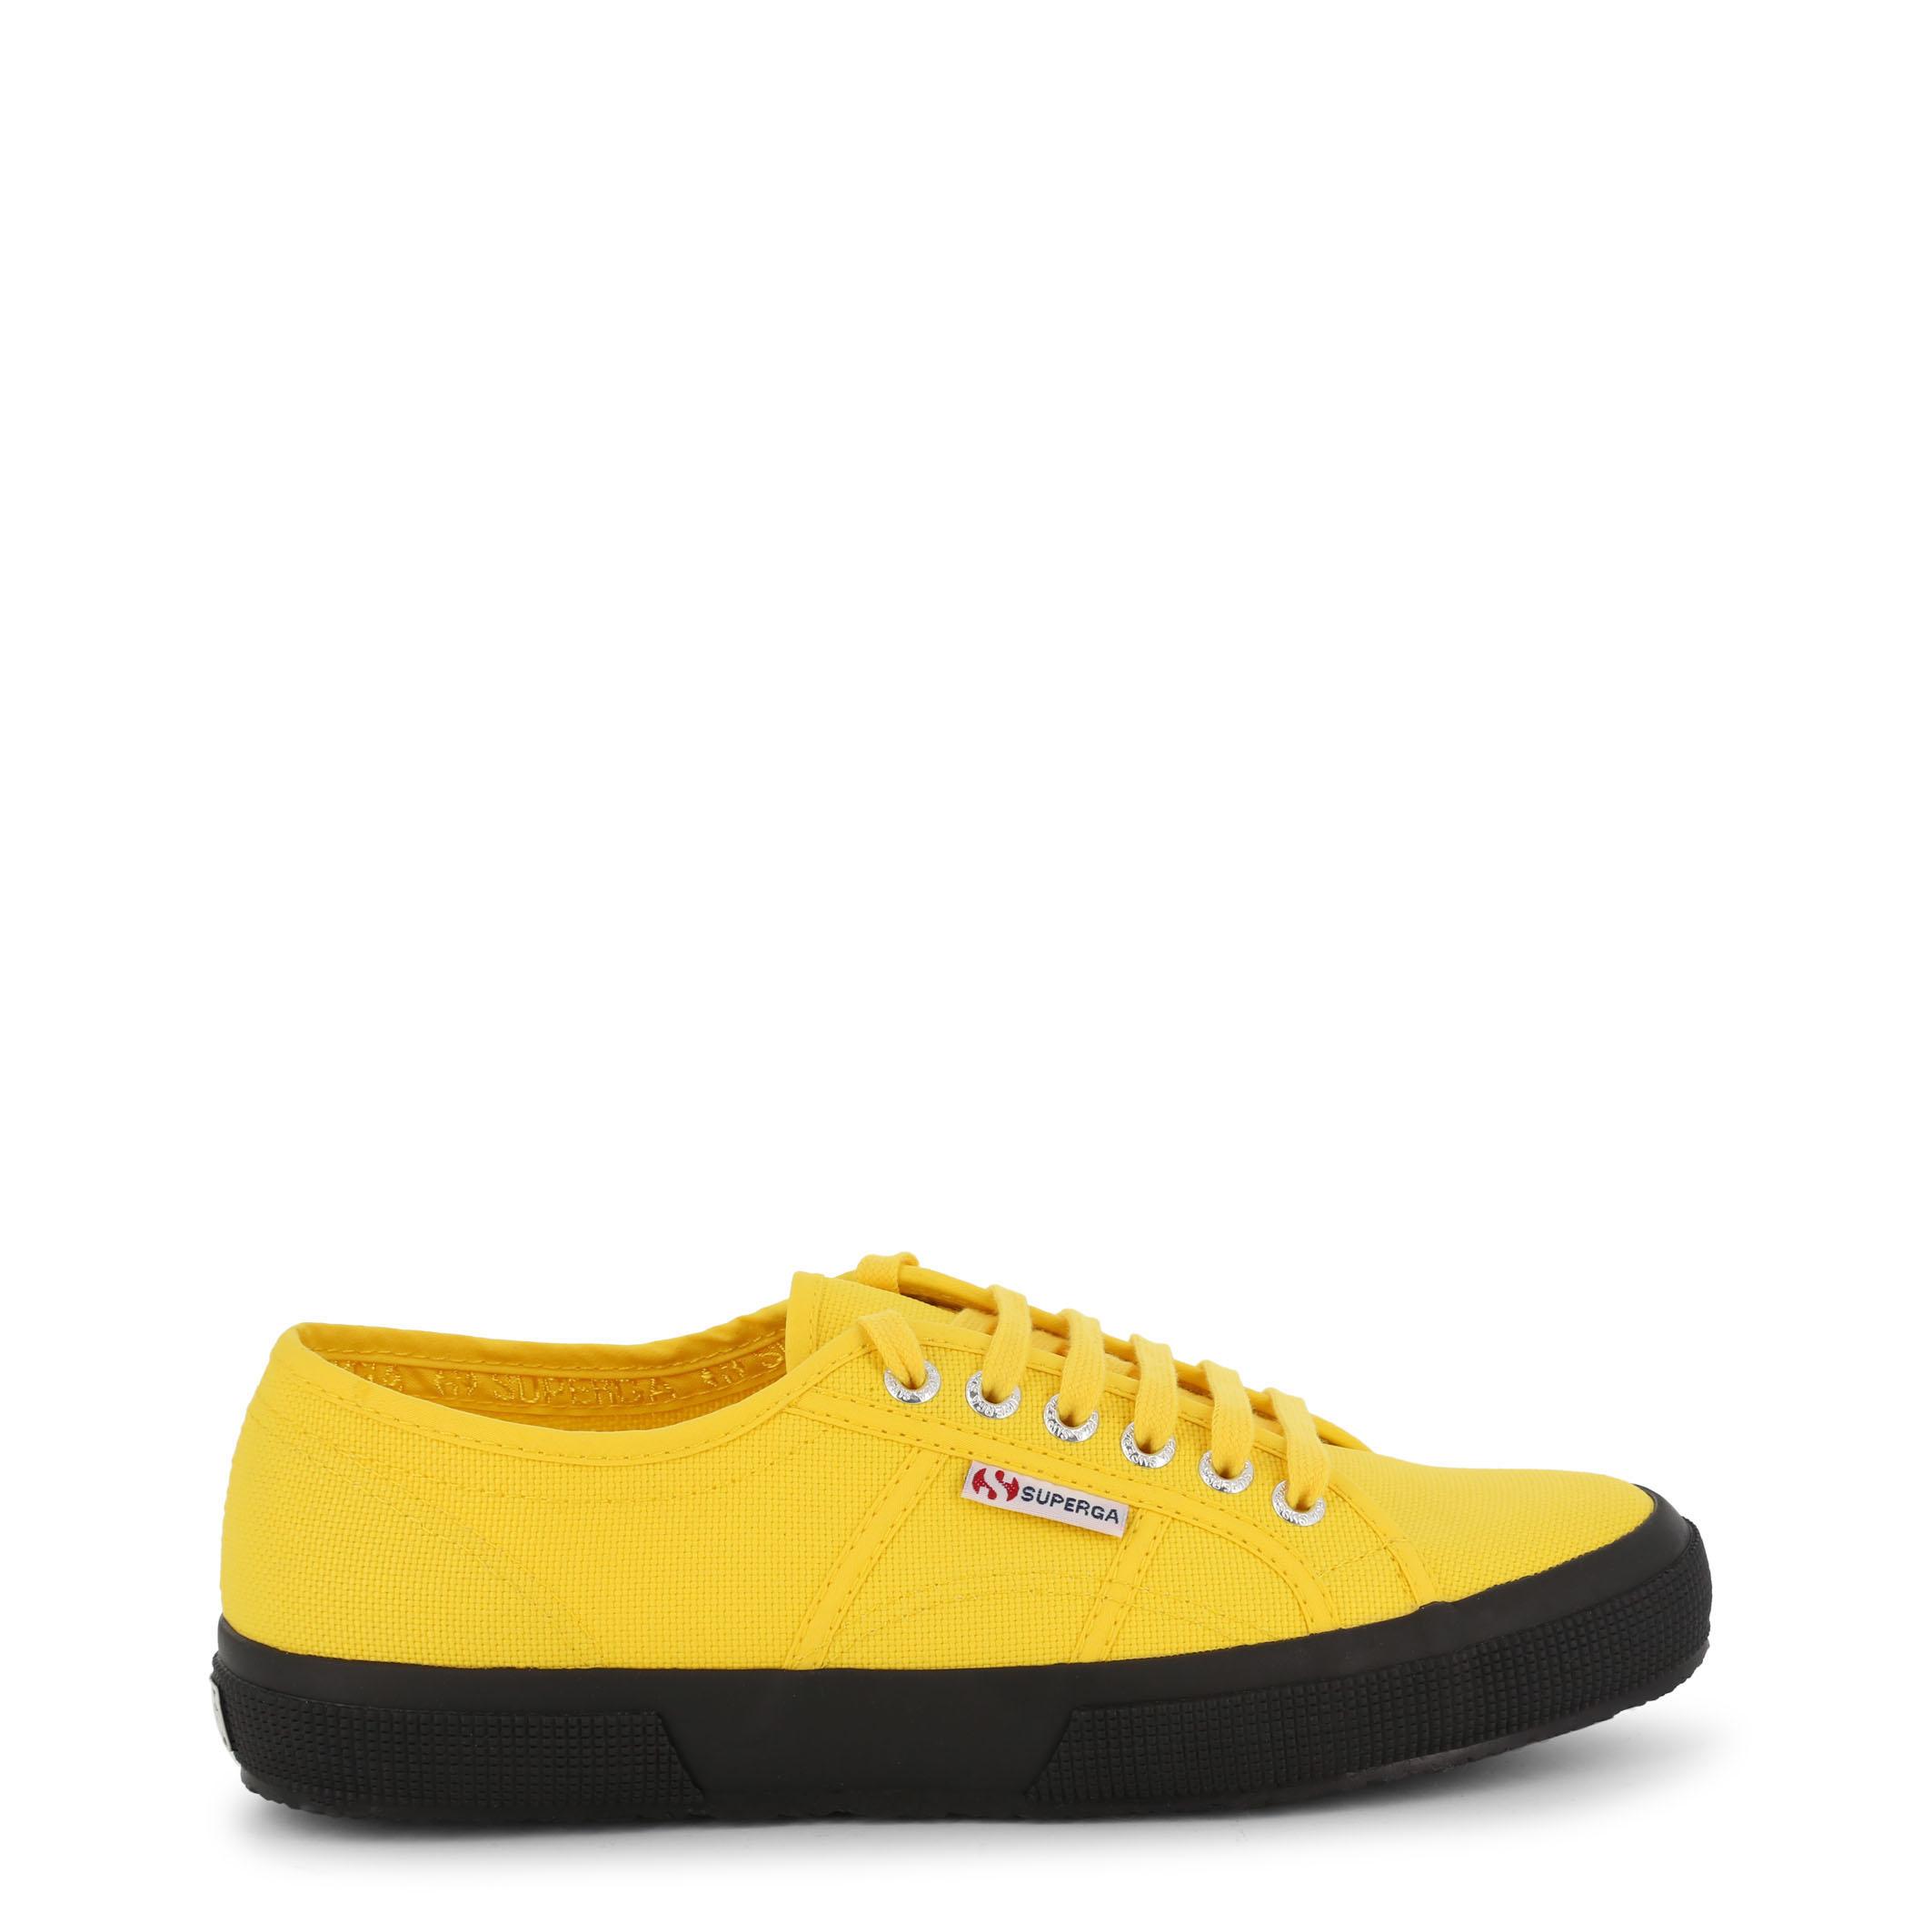 Chaussures de ville  Superga 2750-COTU-CLASSIC yellow